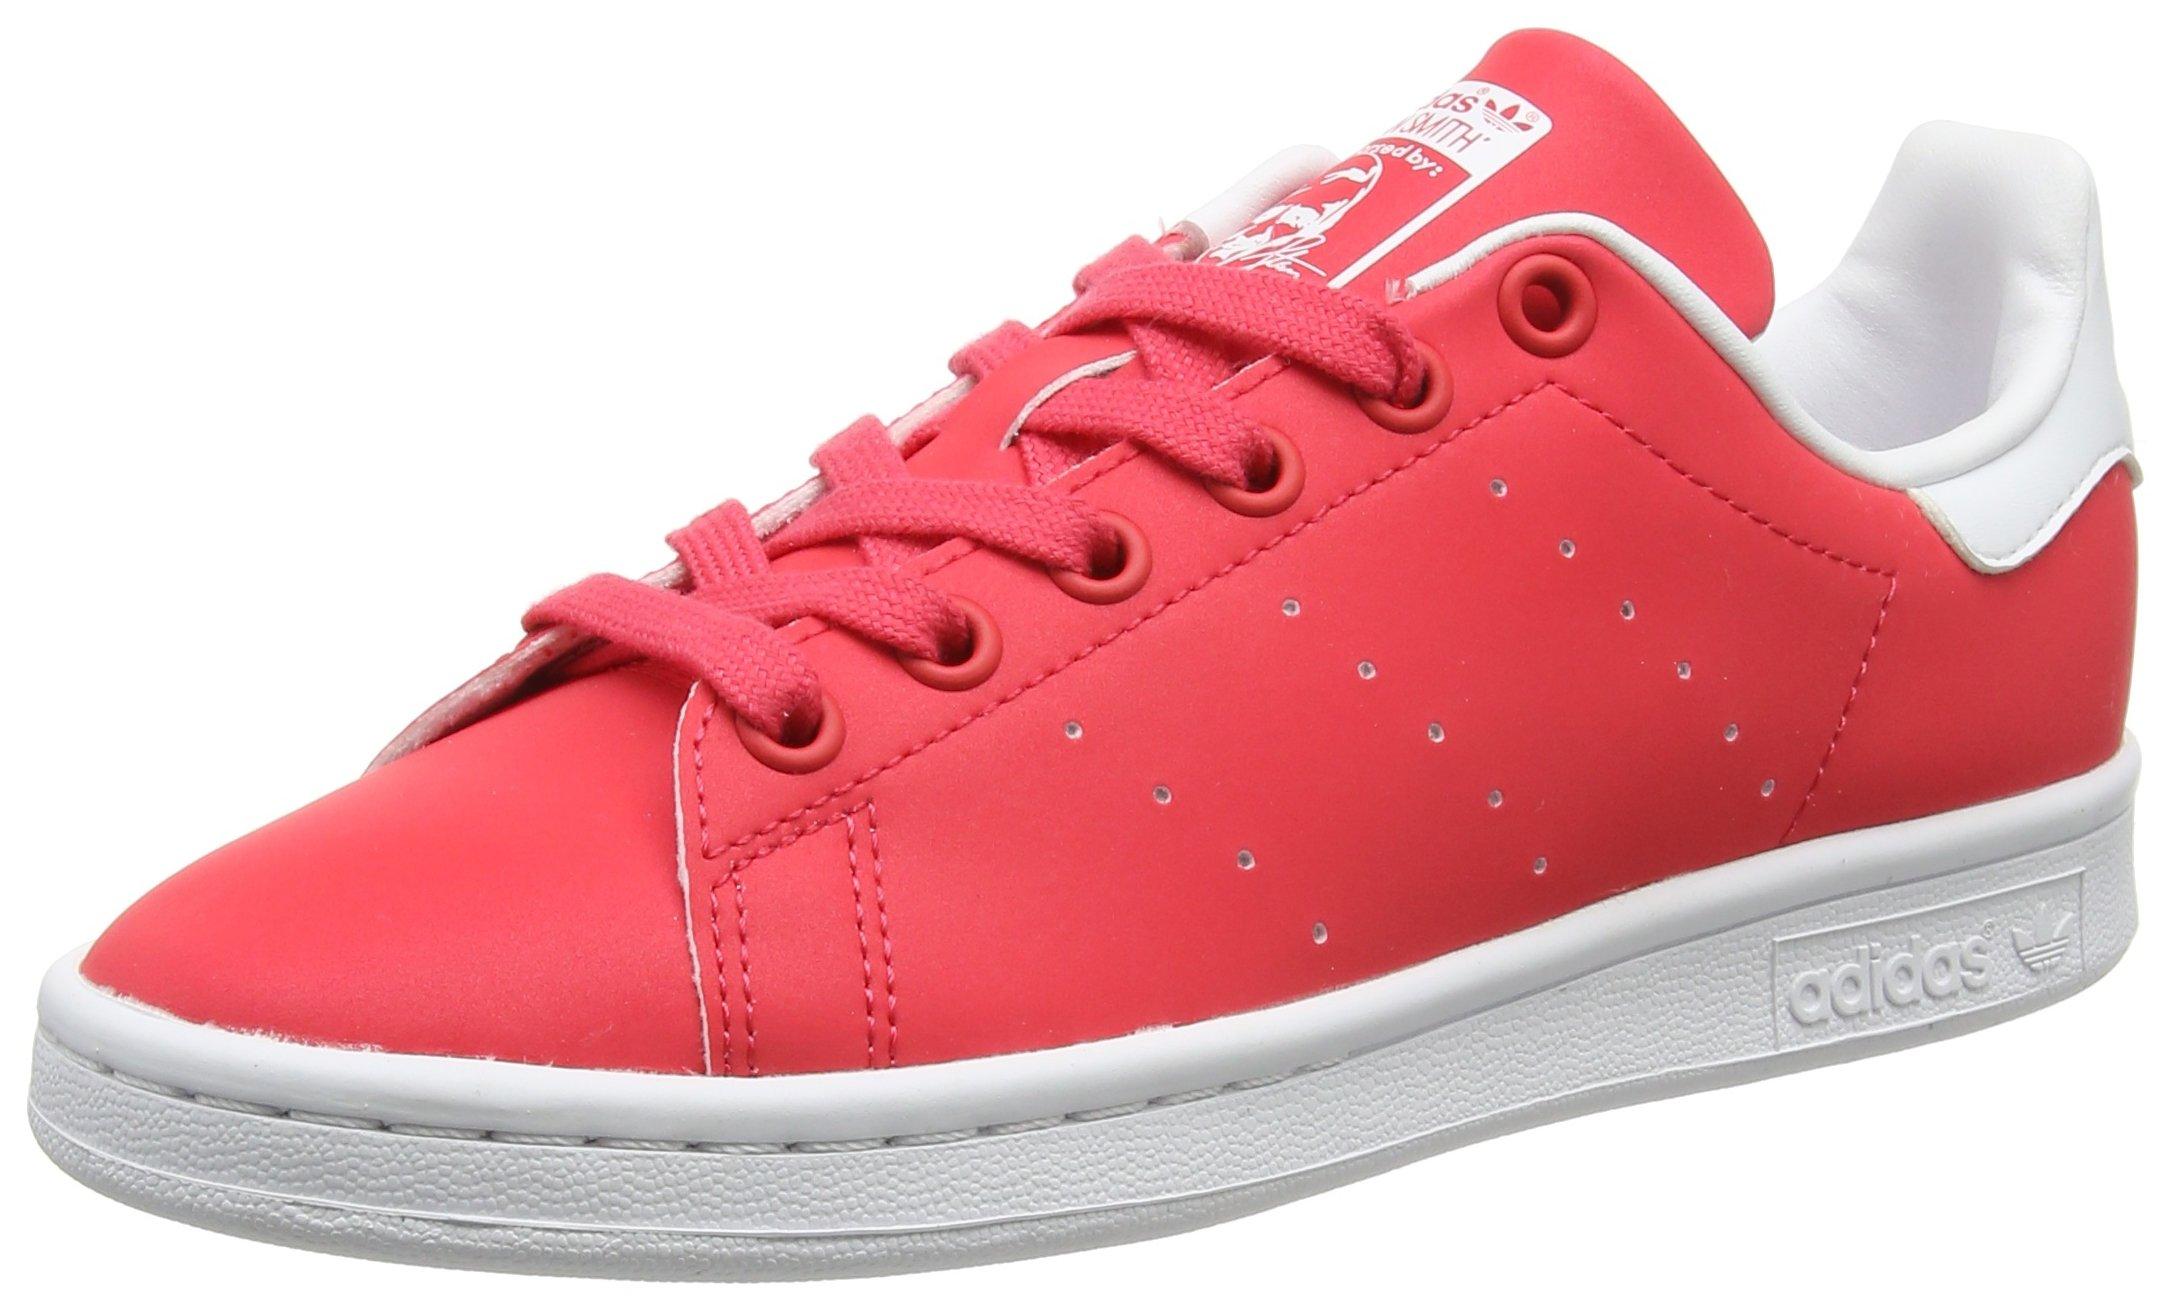 super popular dcc4d cd4b2 Galleon - Adidas Stan Smith Womens Style: BB5154-E-CORPNK ...